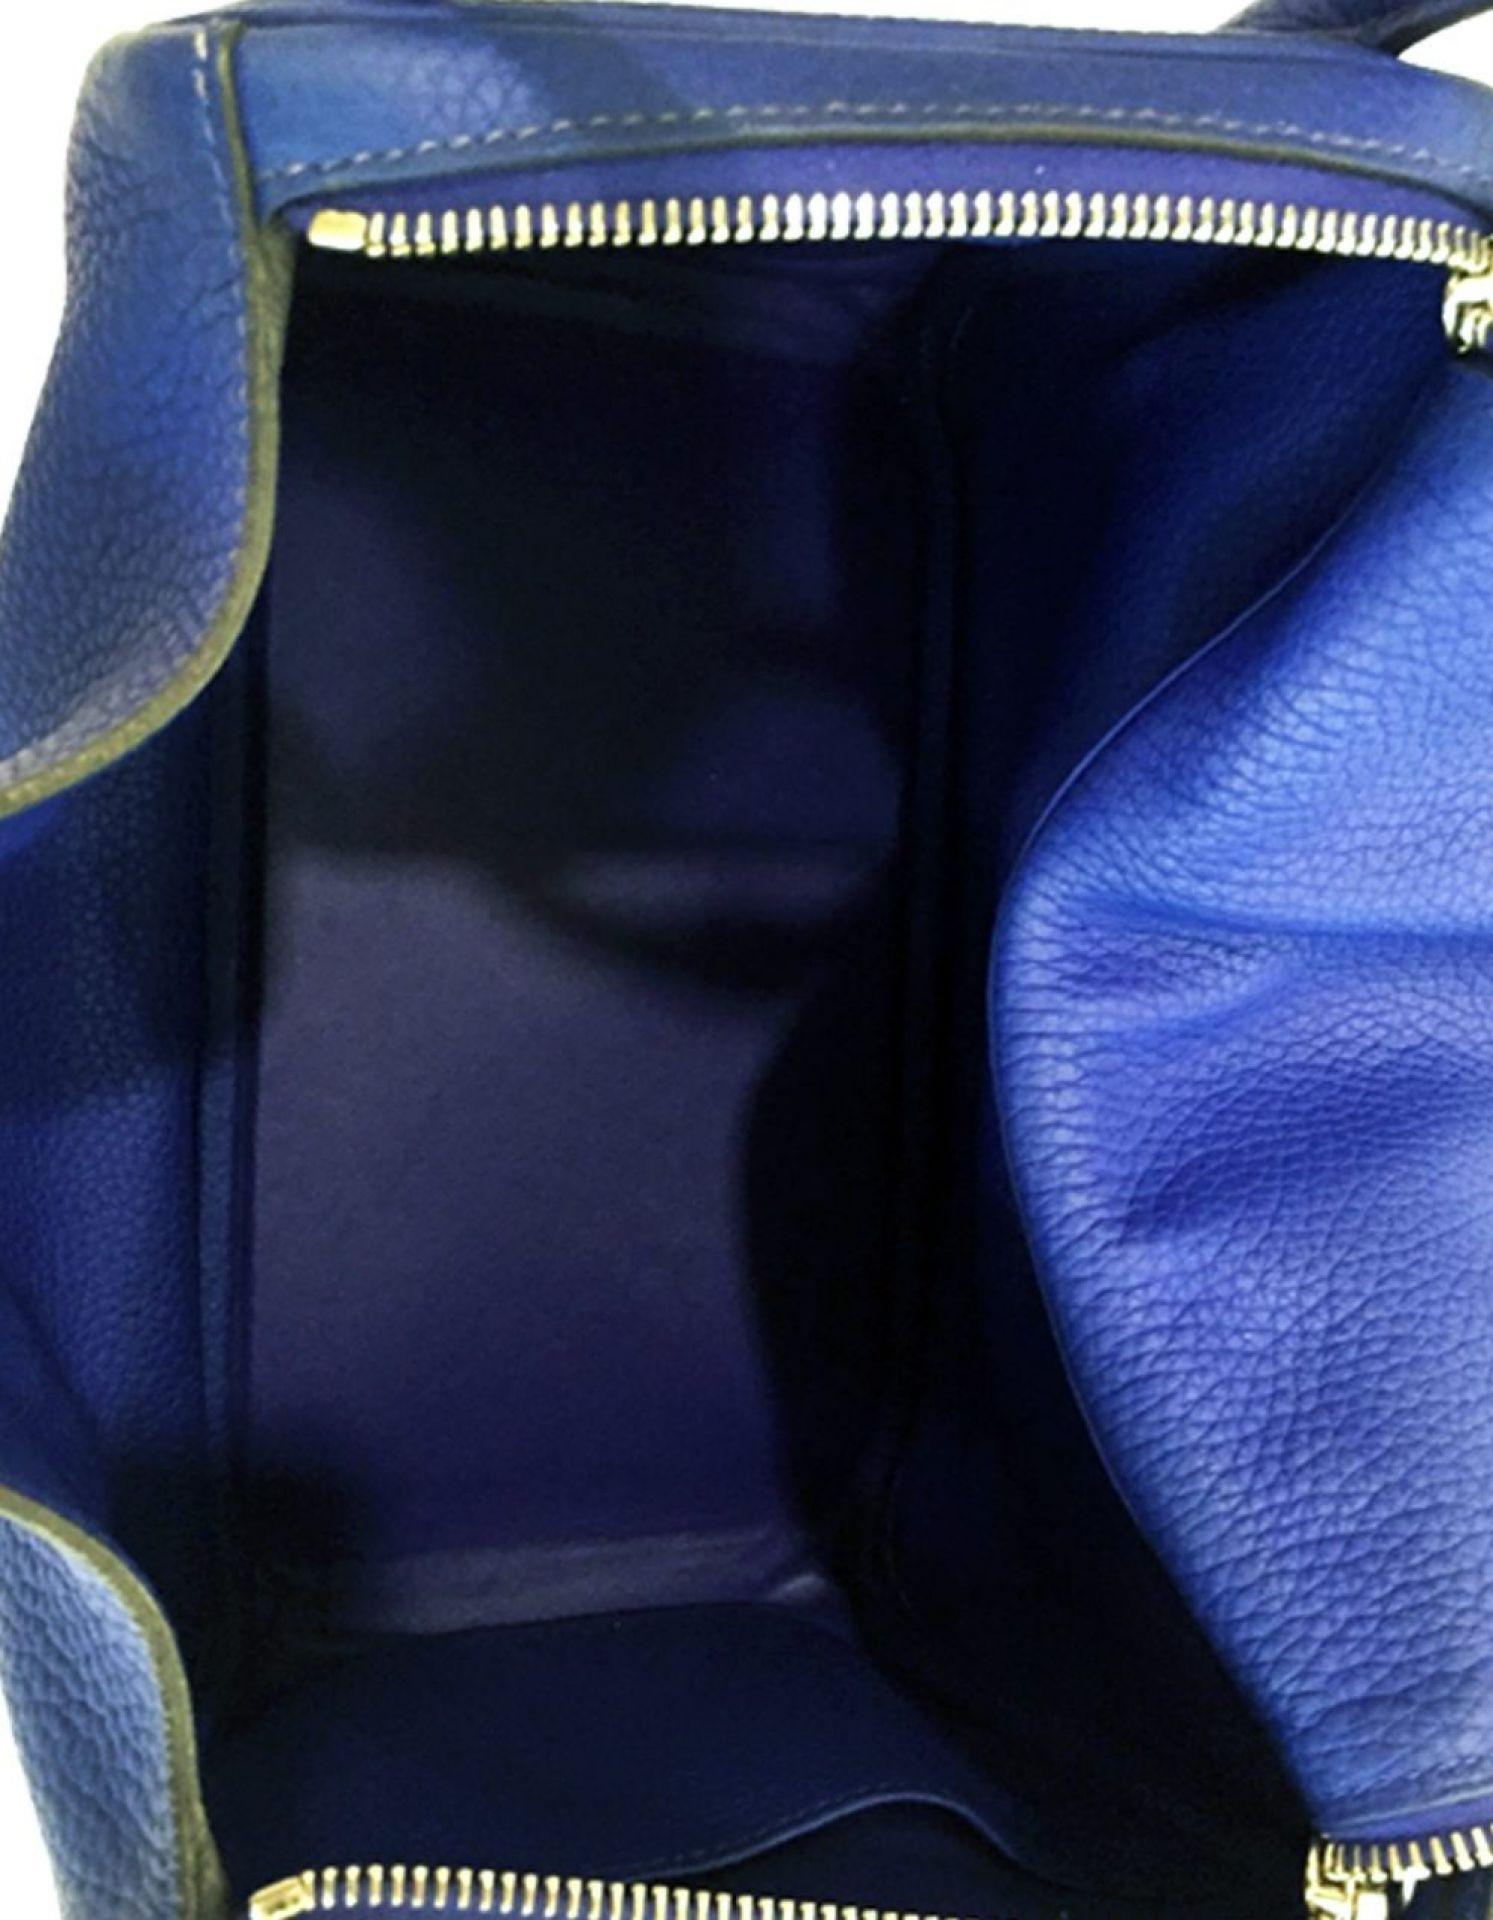 HERMÈS Lindy 30 Clemence Blue Electric PHW